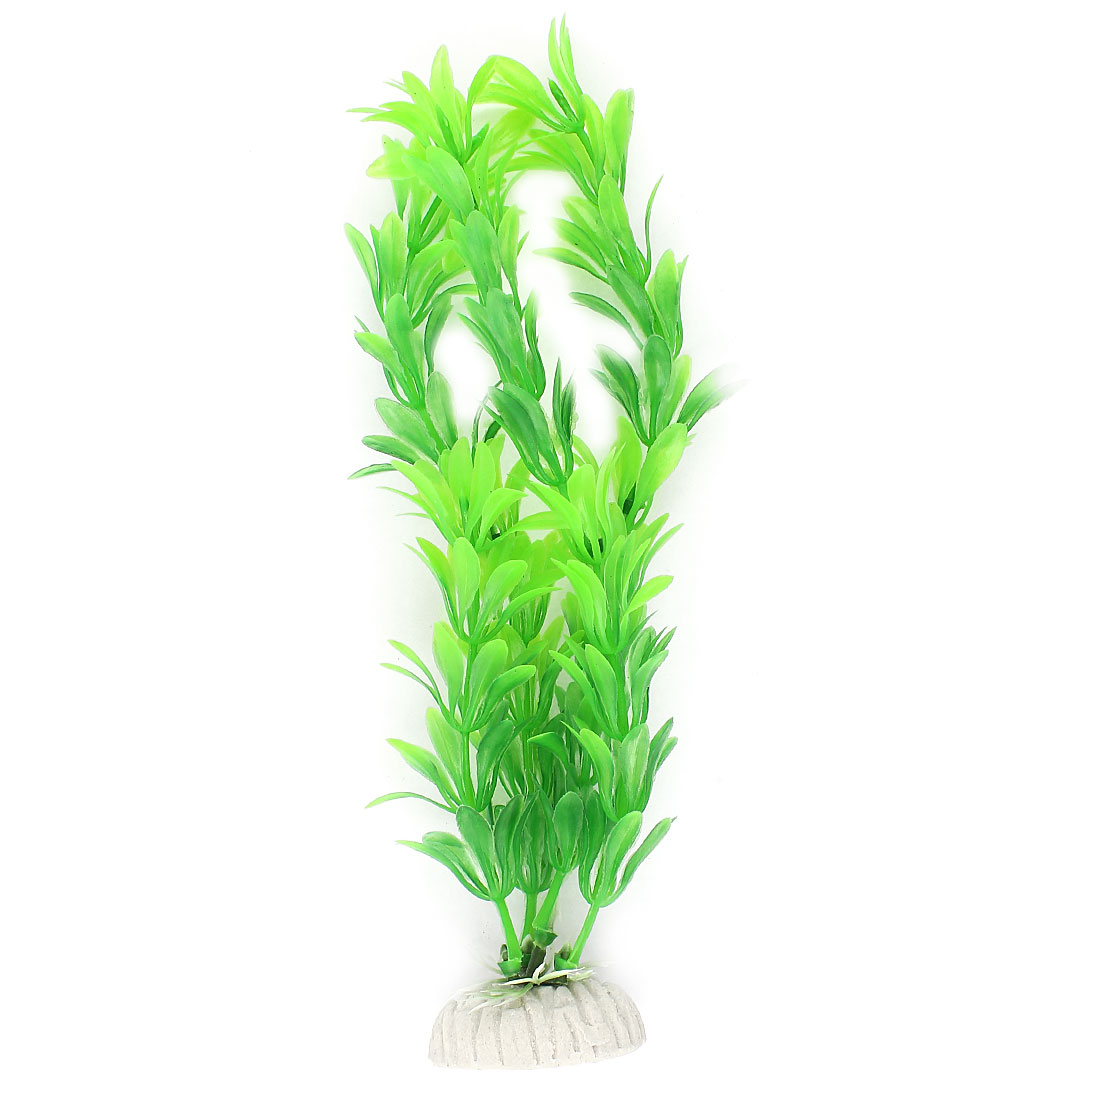 "Manmade Aquascaping Green Plastic Water Grass Plant Fish Tank Aquarium Ornament 8"""